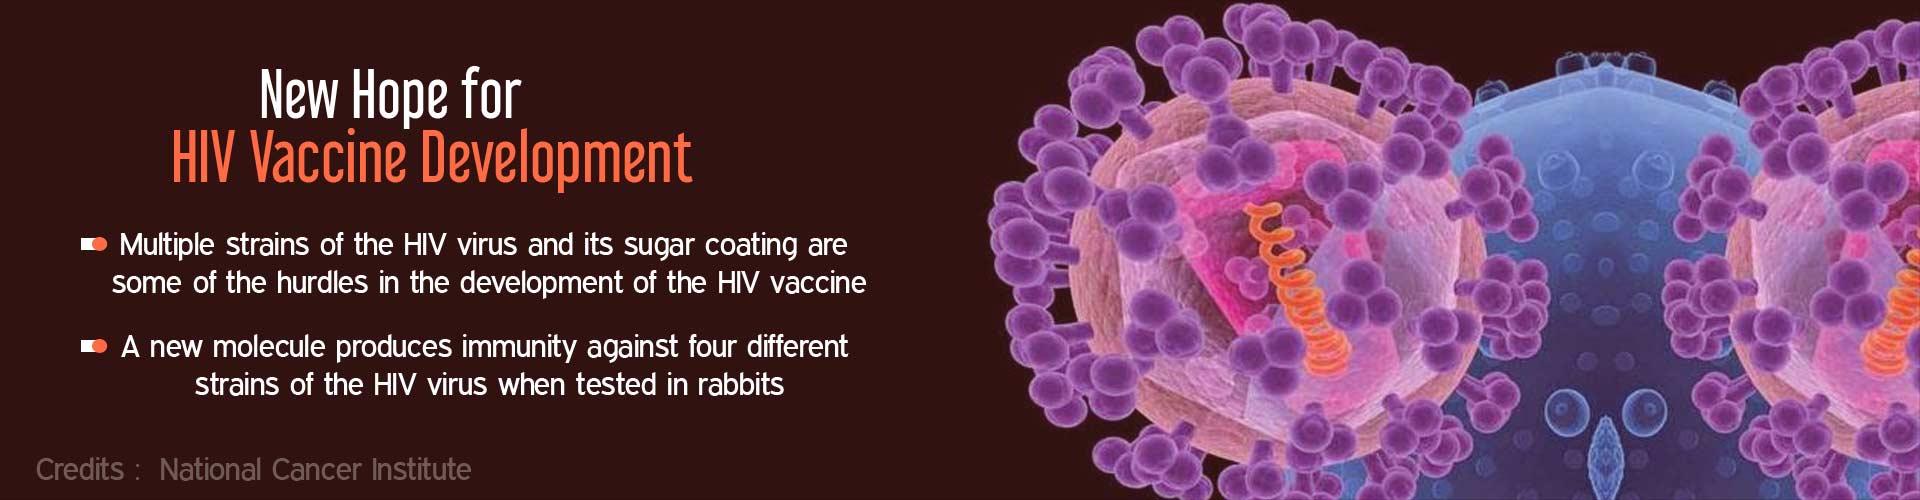 New HIV Vaccine Candidate Molecule Developed